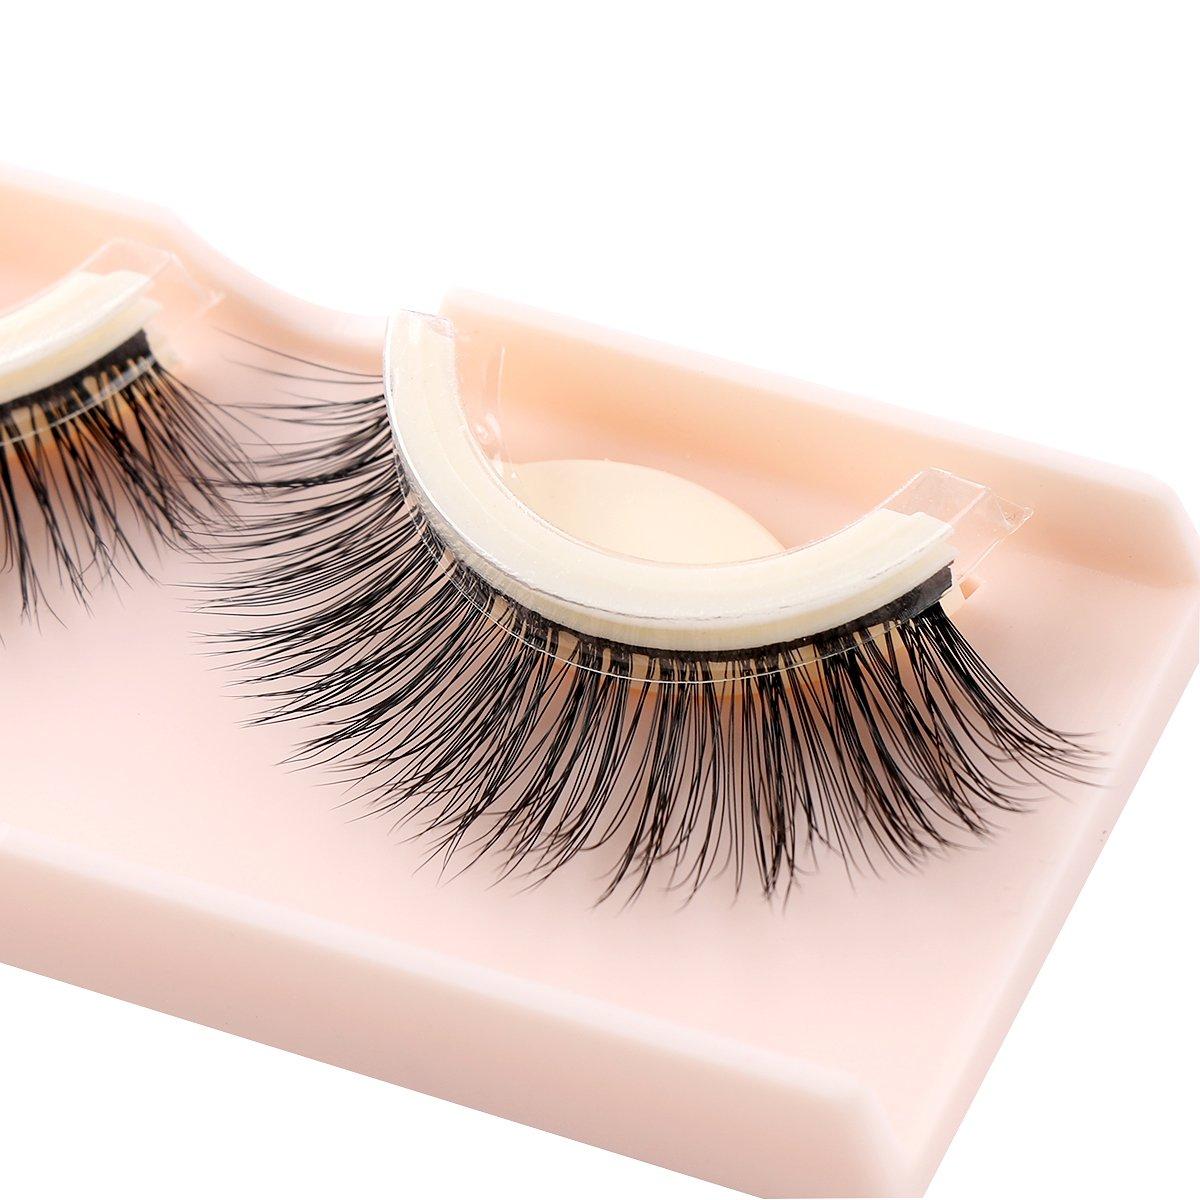 1Pair 3D Mink False Eyelashes Self Adhesive Makeup Fake Lashes Extension Beauty (c) Limado